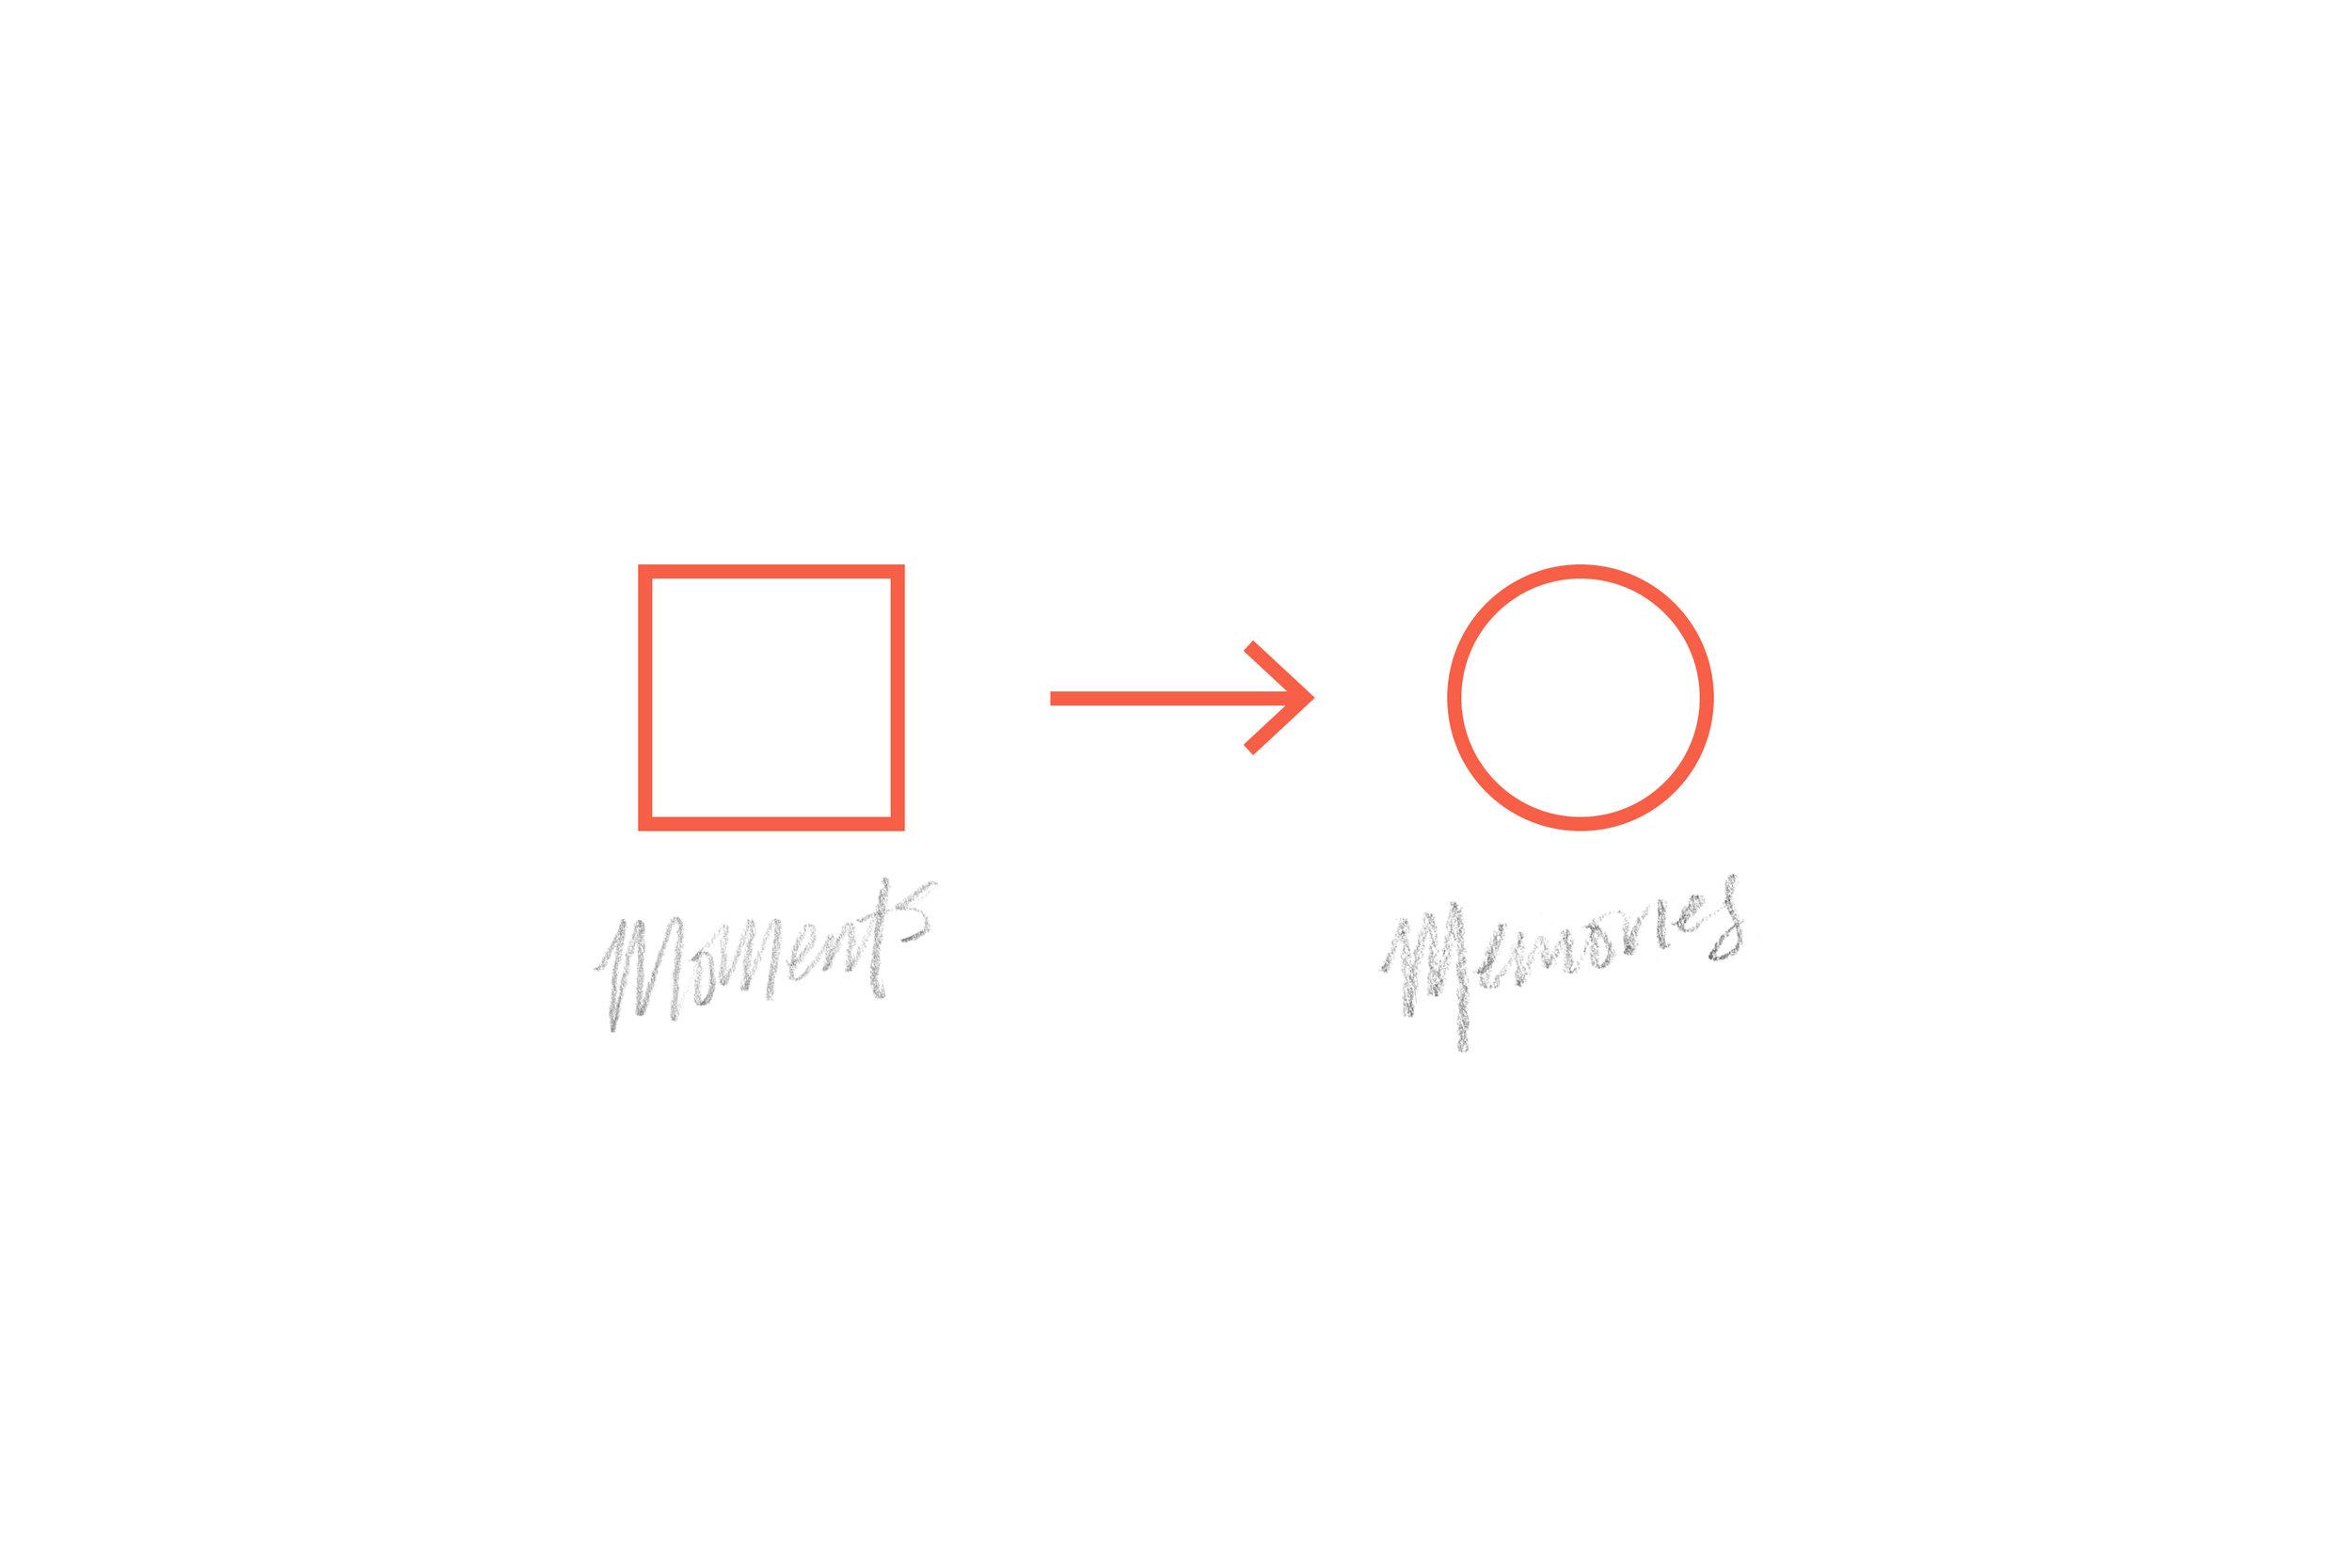 storymomentsmemories.jpg